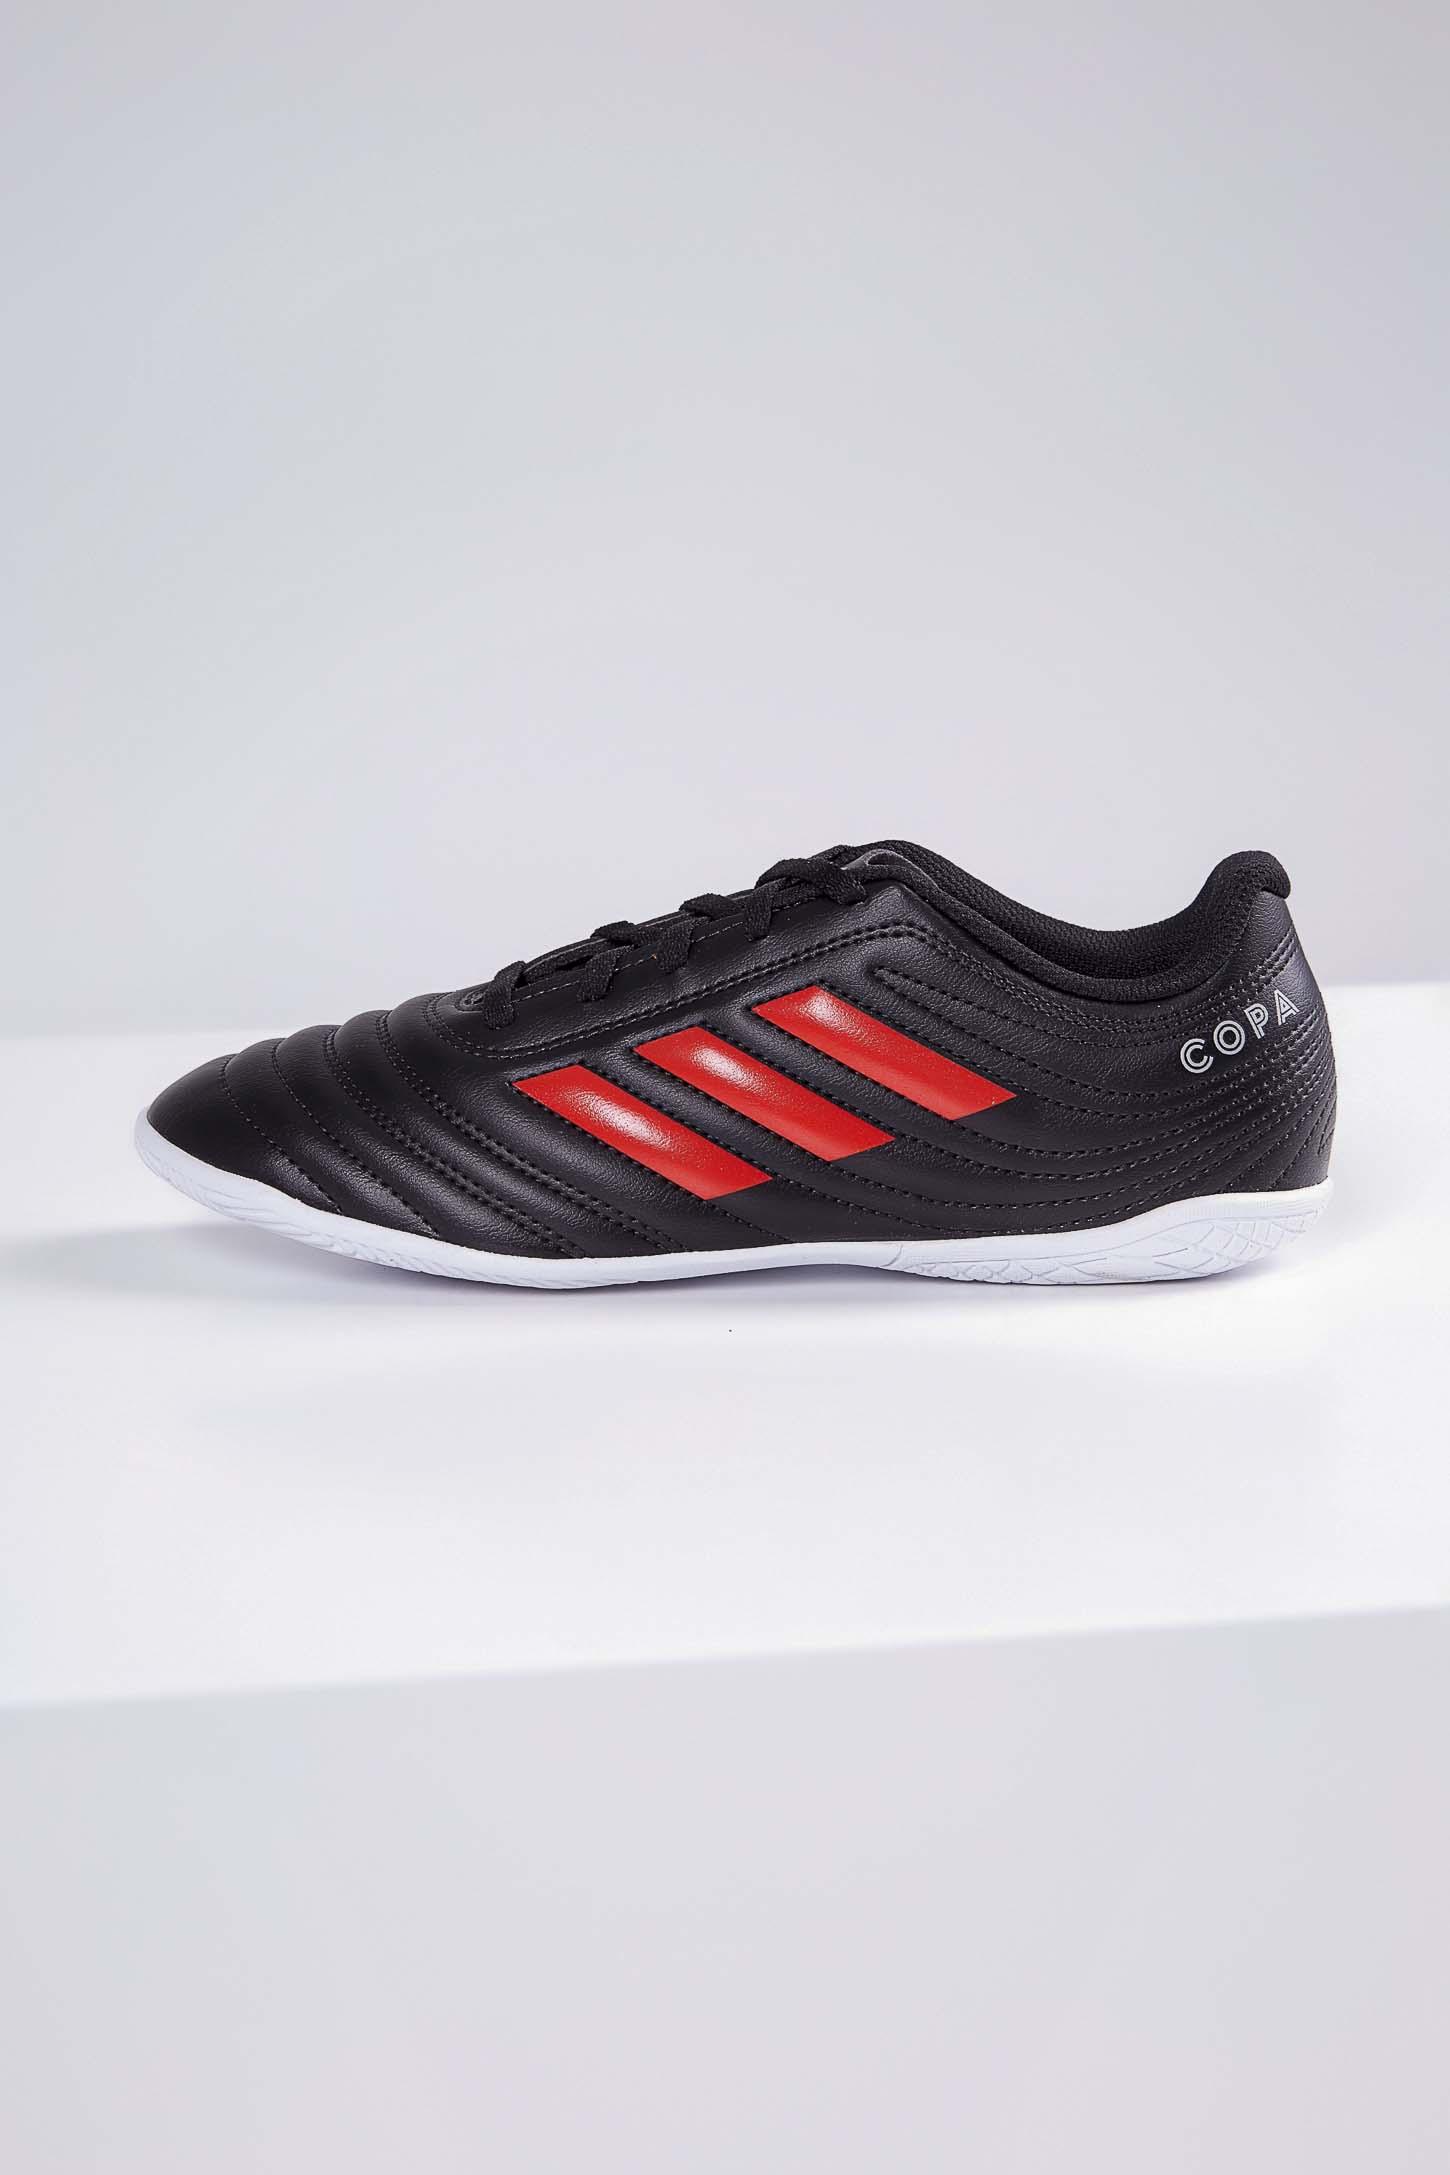 Chuteira-Copa-Futsal-Infantil-Adidas-Preto-